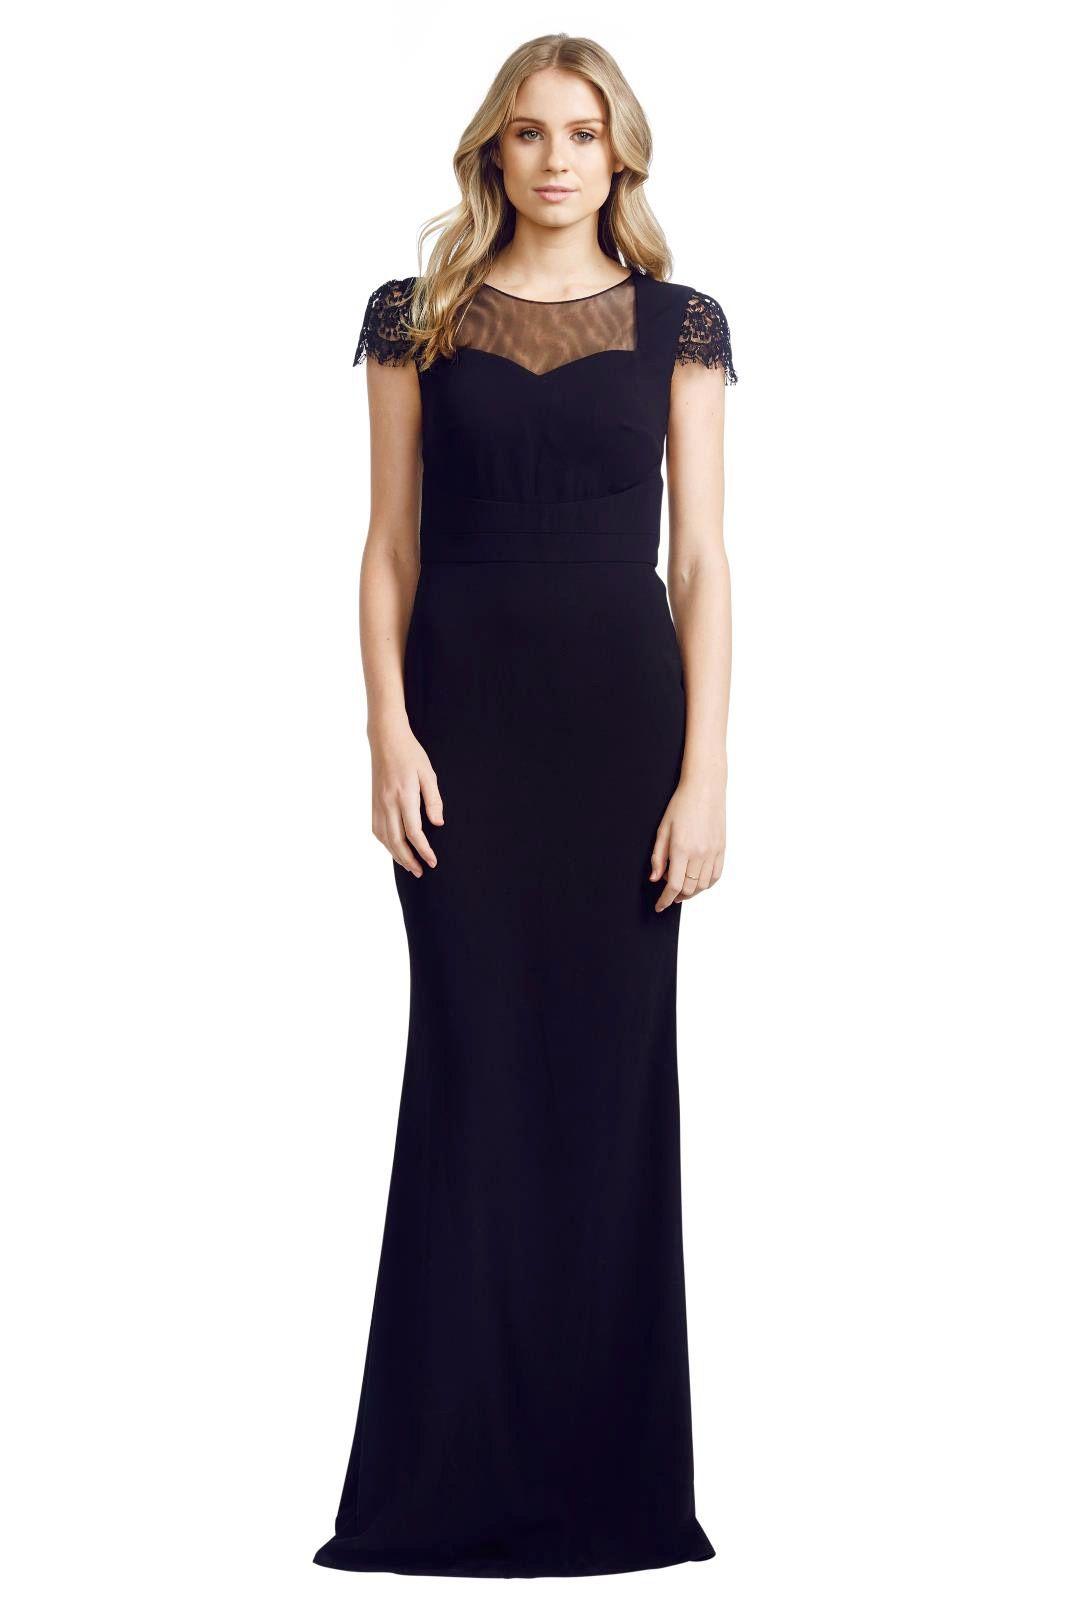 Cristallini - Adorn Gown - Black - Front